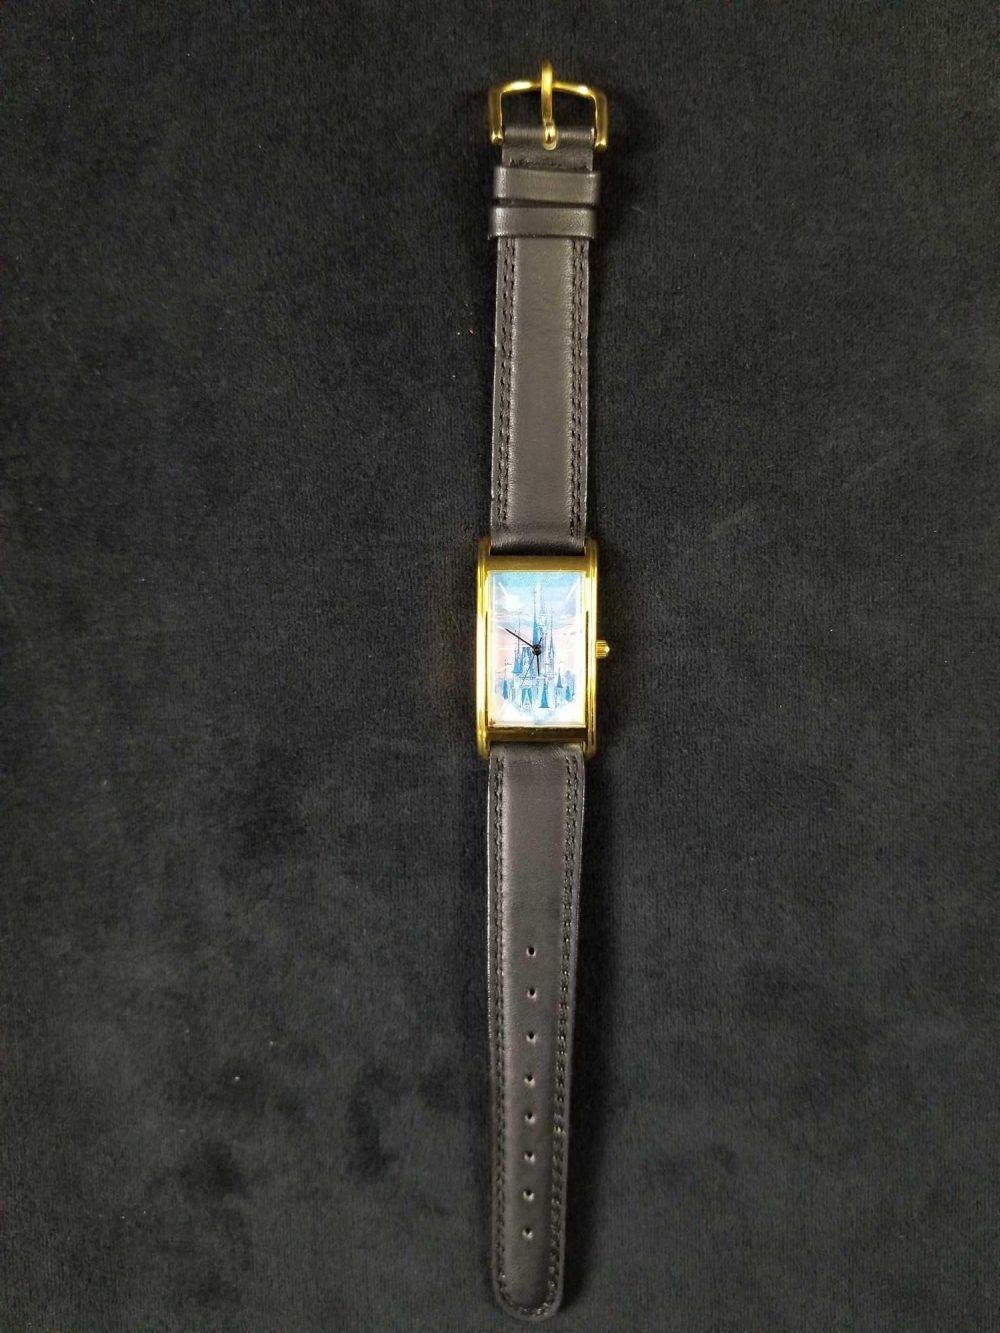 Lot 841: Disney Limited Edition Watch of Cinderellas Castle